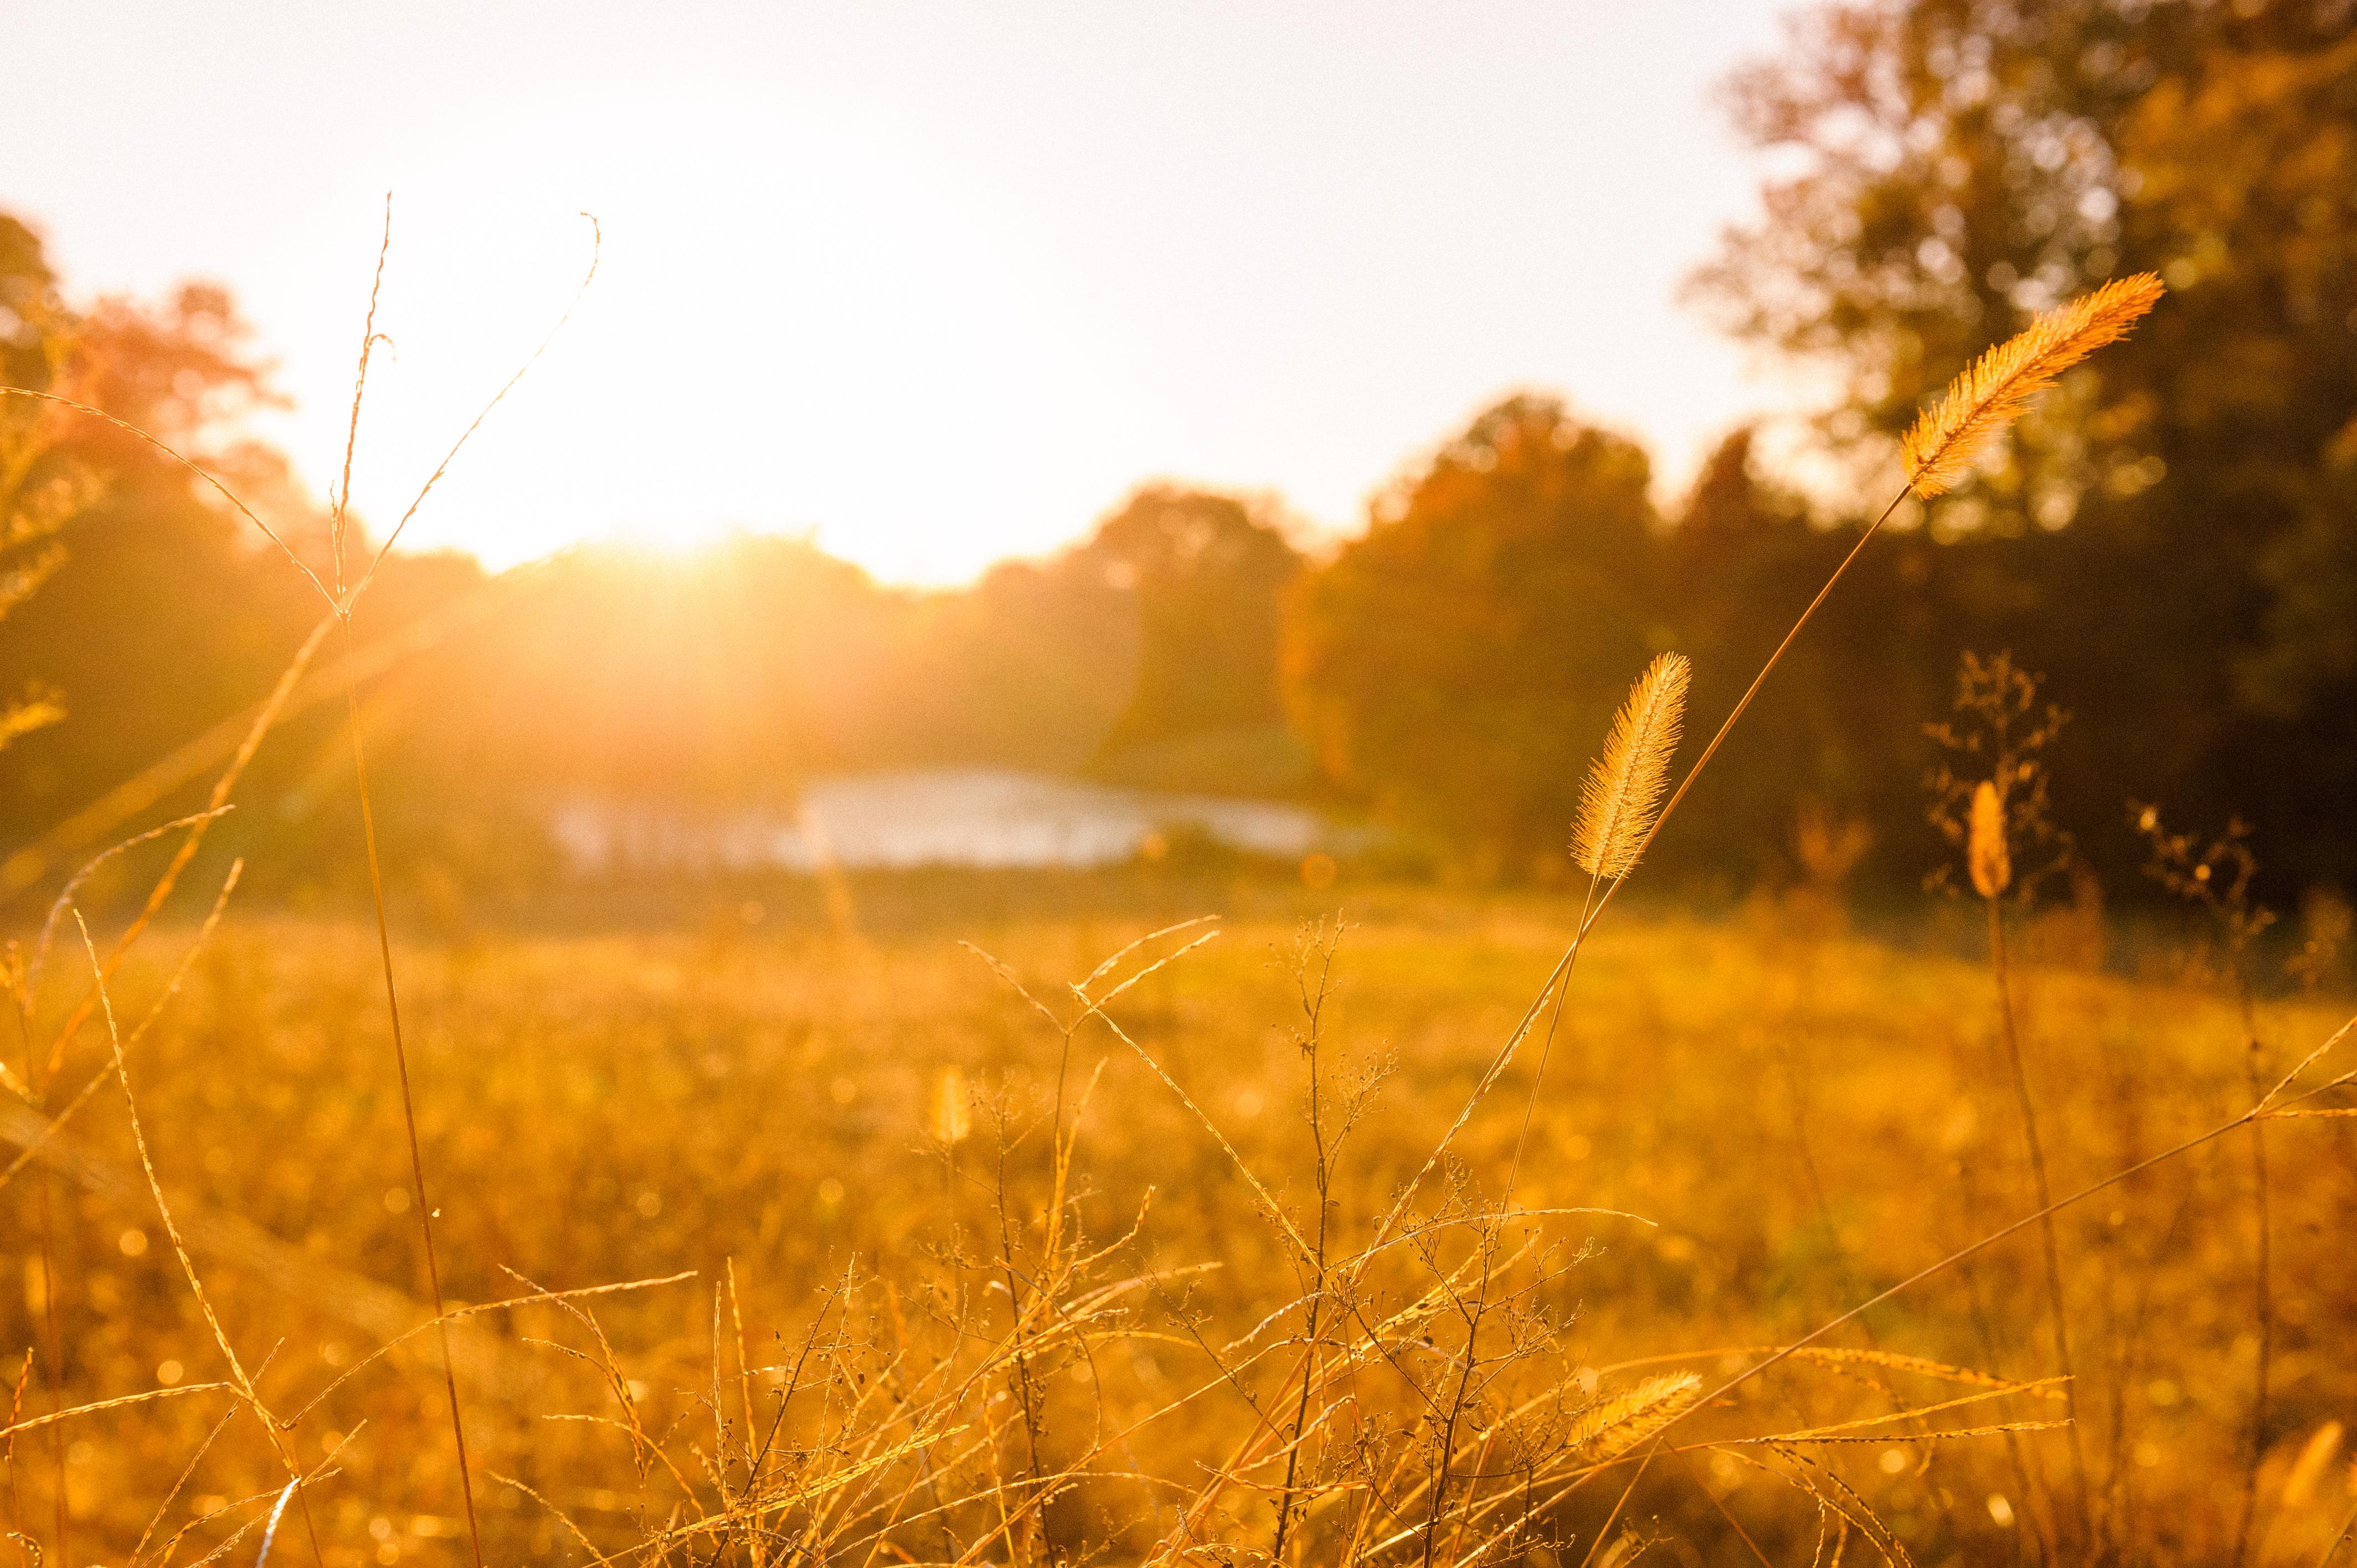 Summer field photo